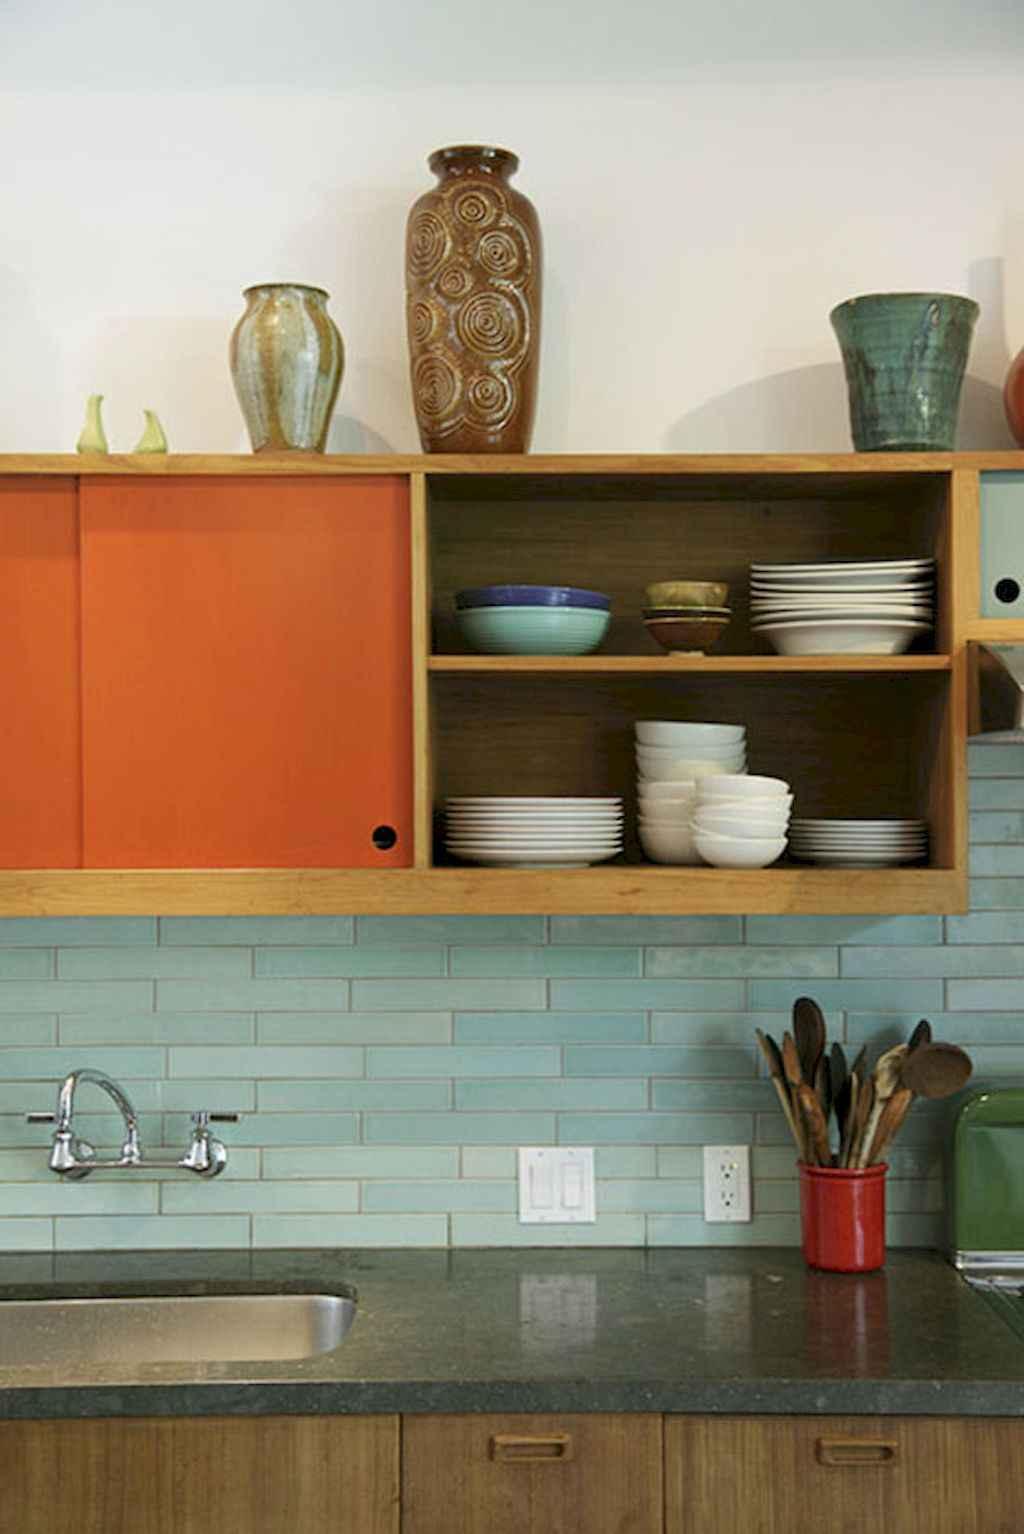 Mid century modern kitchen design ideas (8)